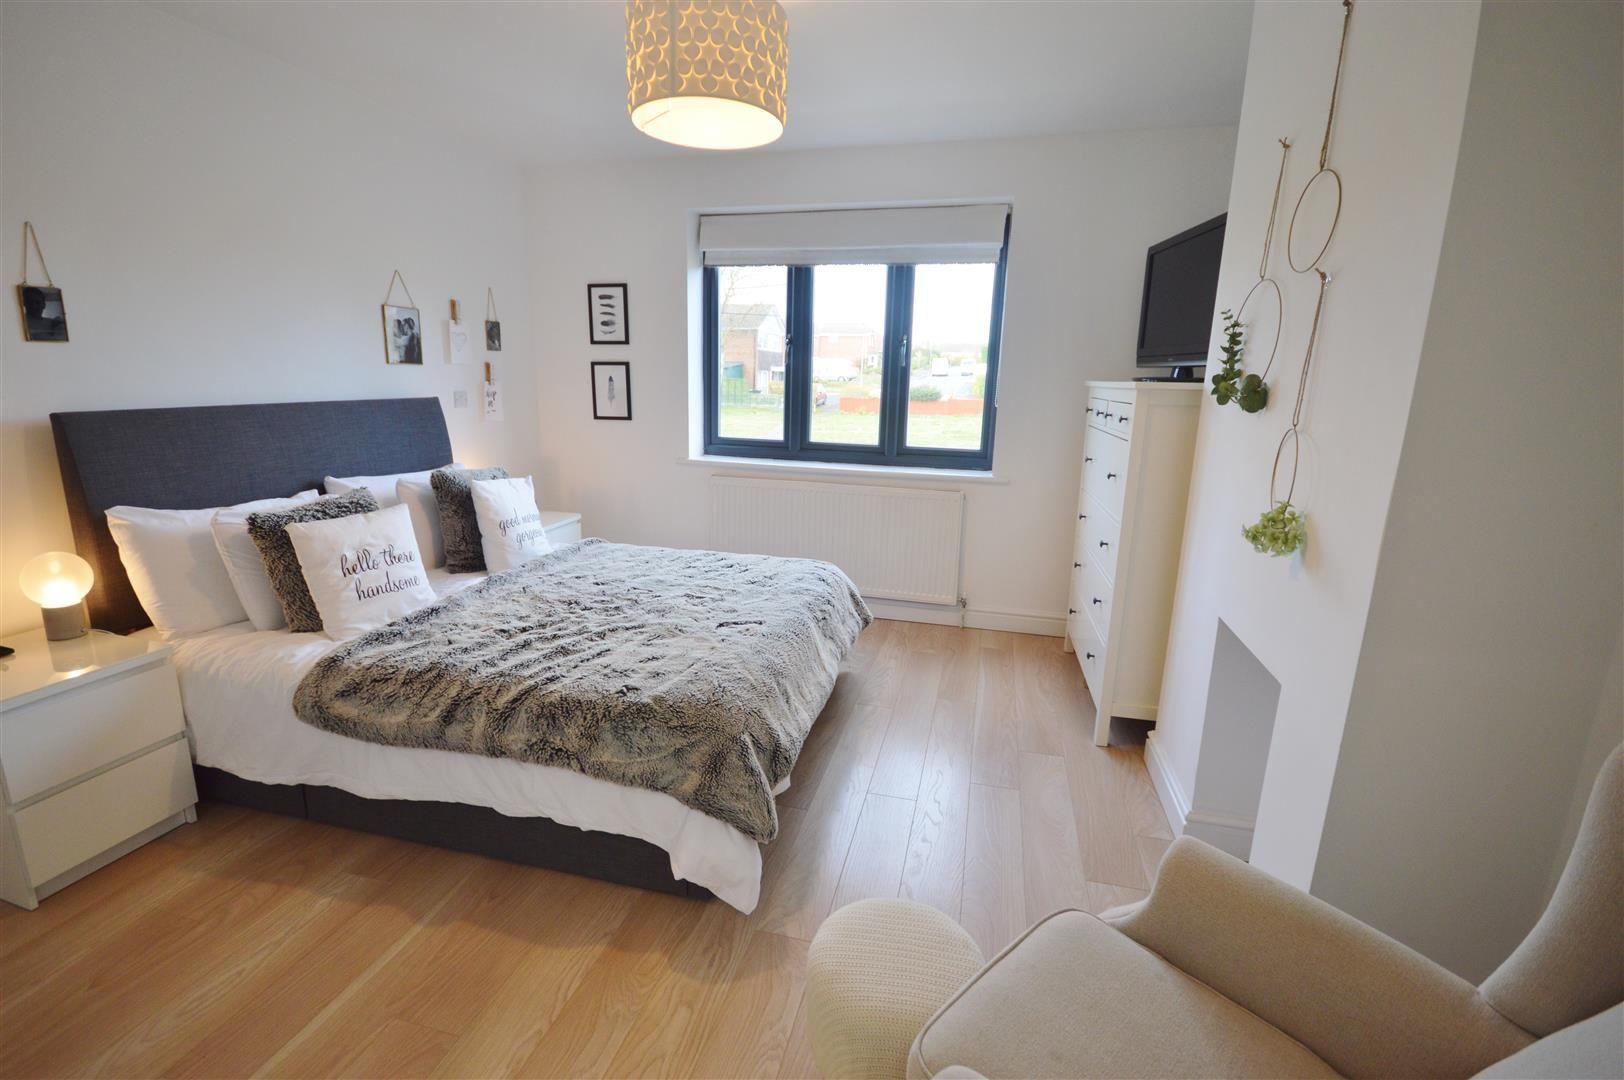 5 bed detached for sale in Leominster 9